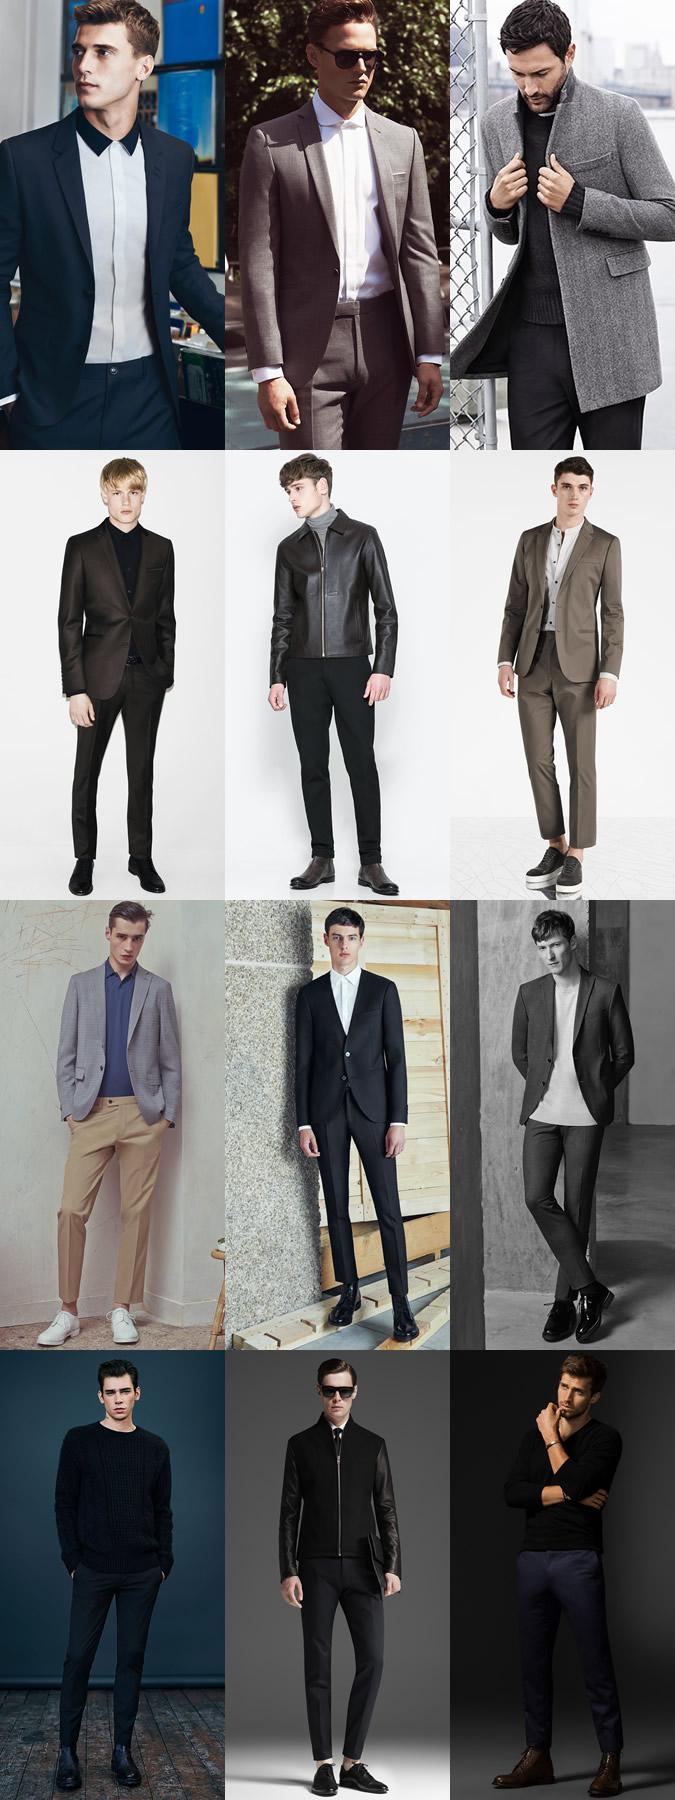 men business casual photo - 1